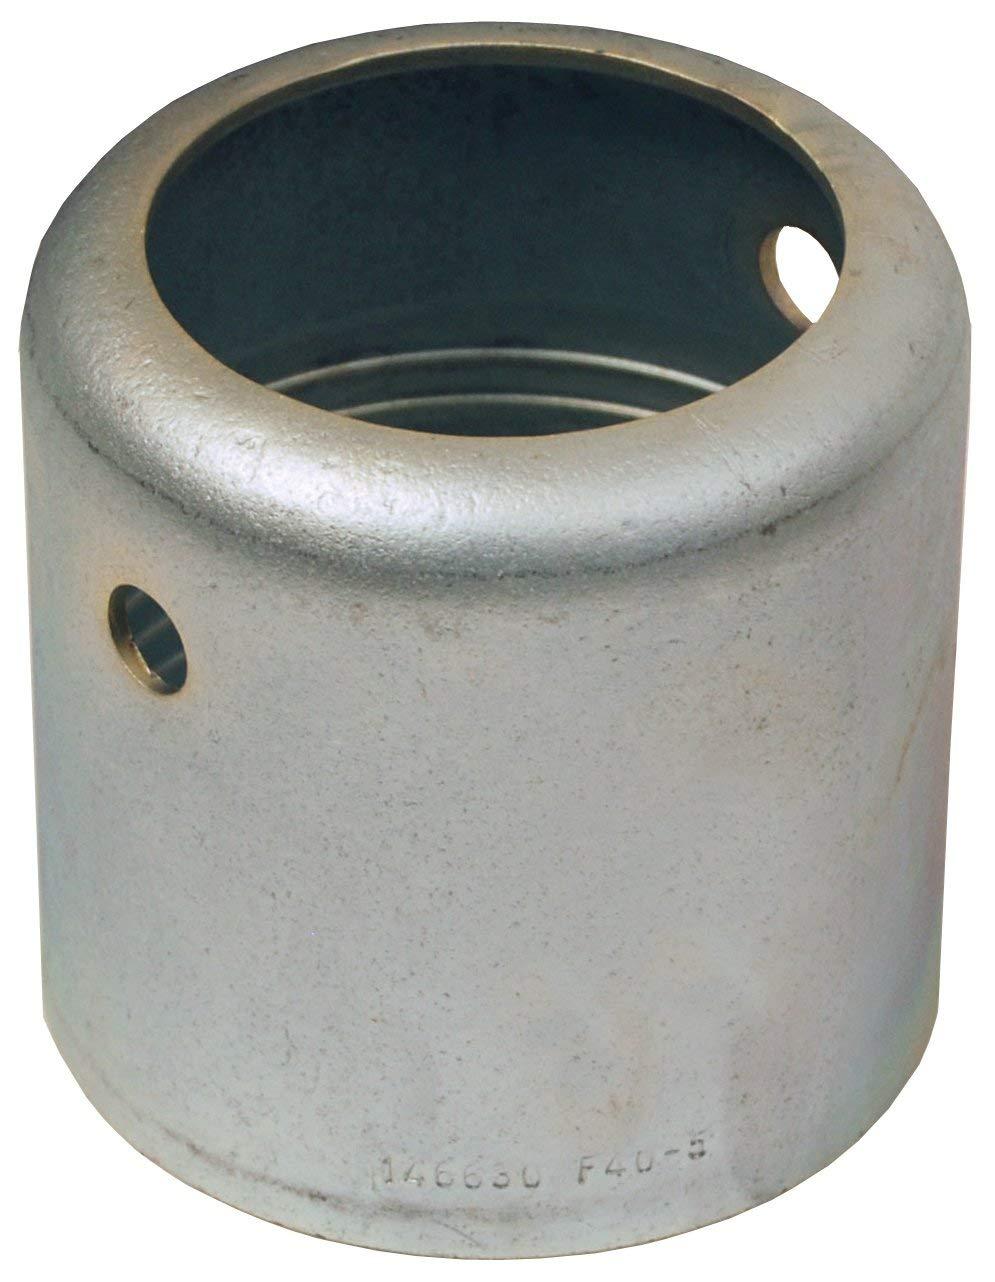 Dixon Plated Carbon Steel Standard External Swage Ferrule F96-5